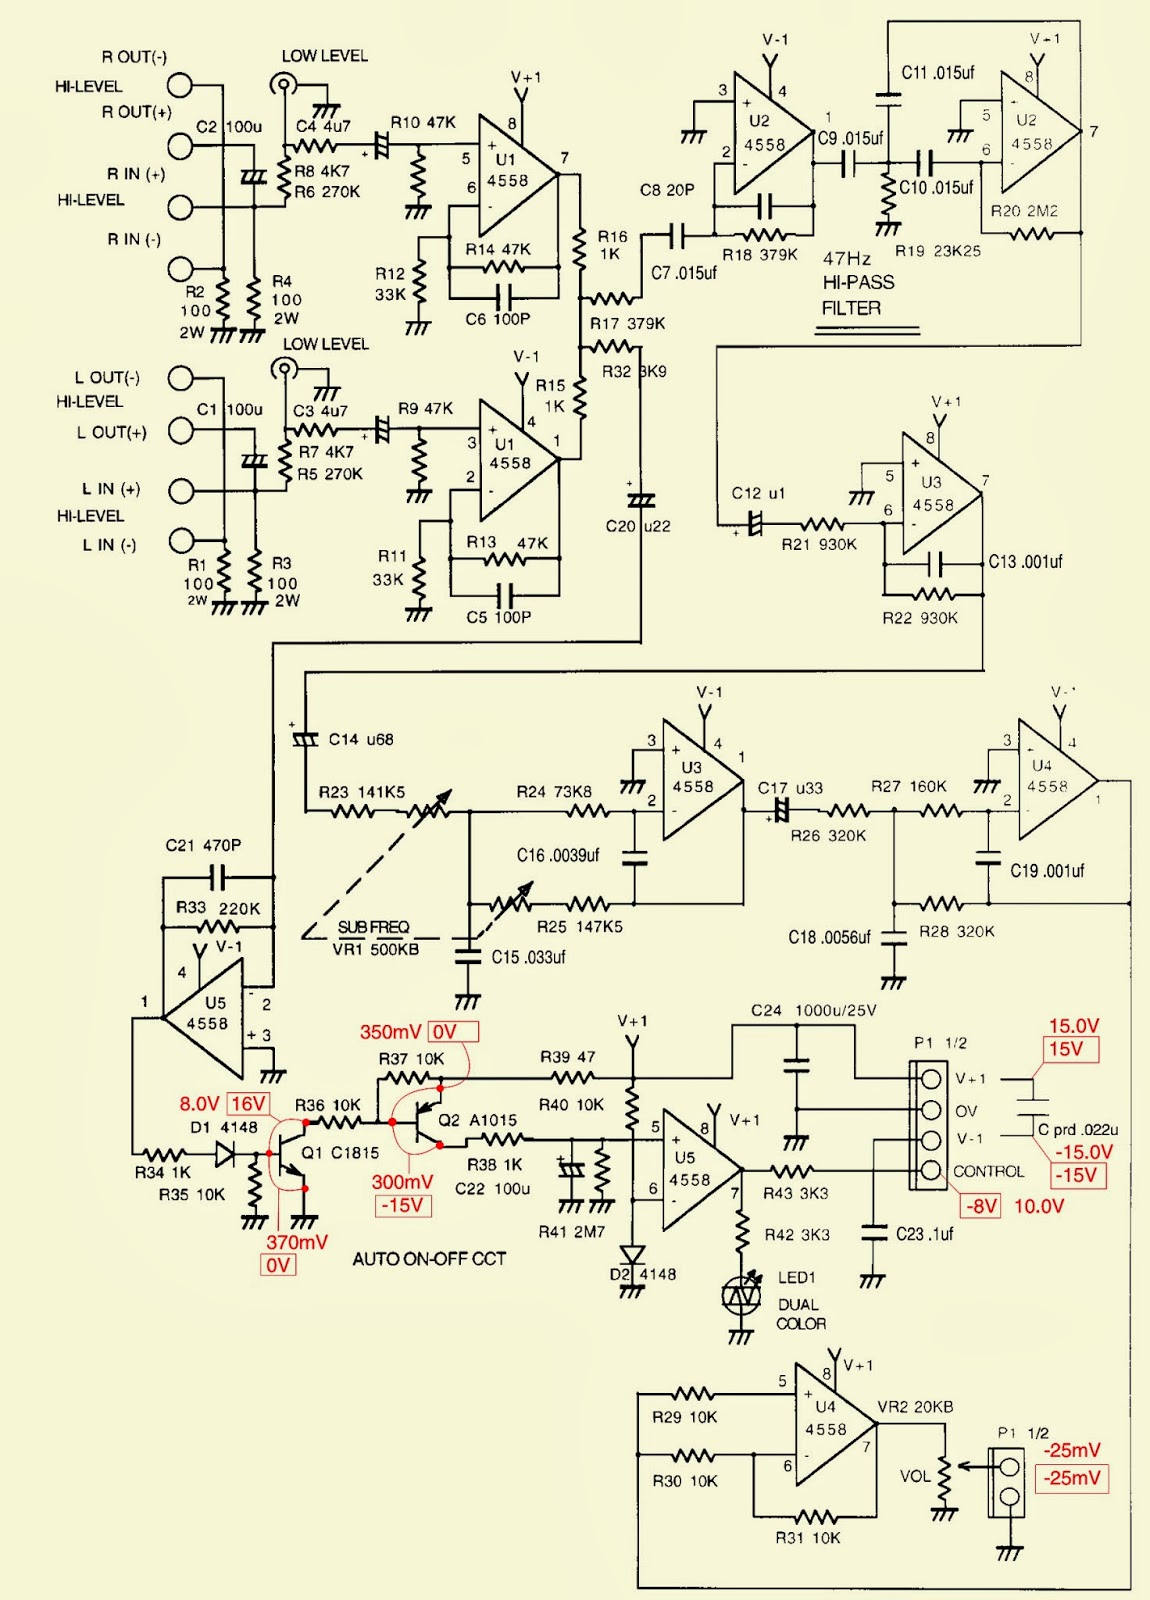 hight resolution of jbl arc sub test procedure schematic diagram circuit diagram jbl arc sub test procedure schematic diagram circuit diagram